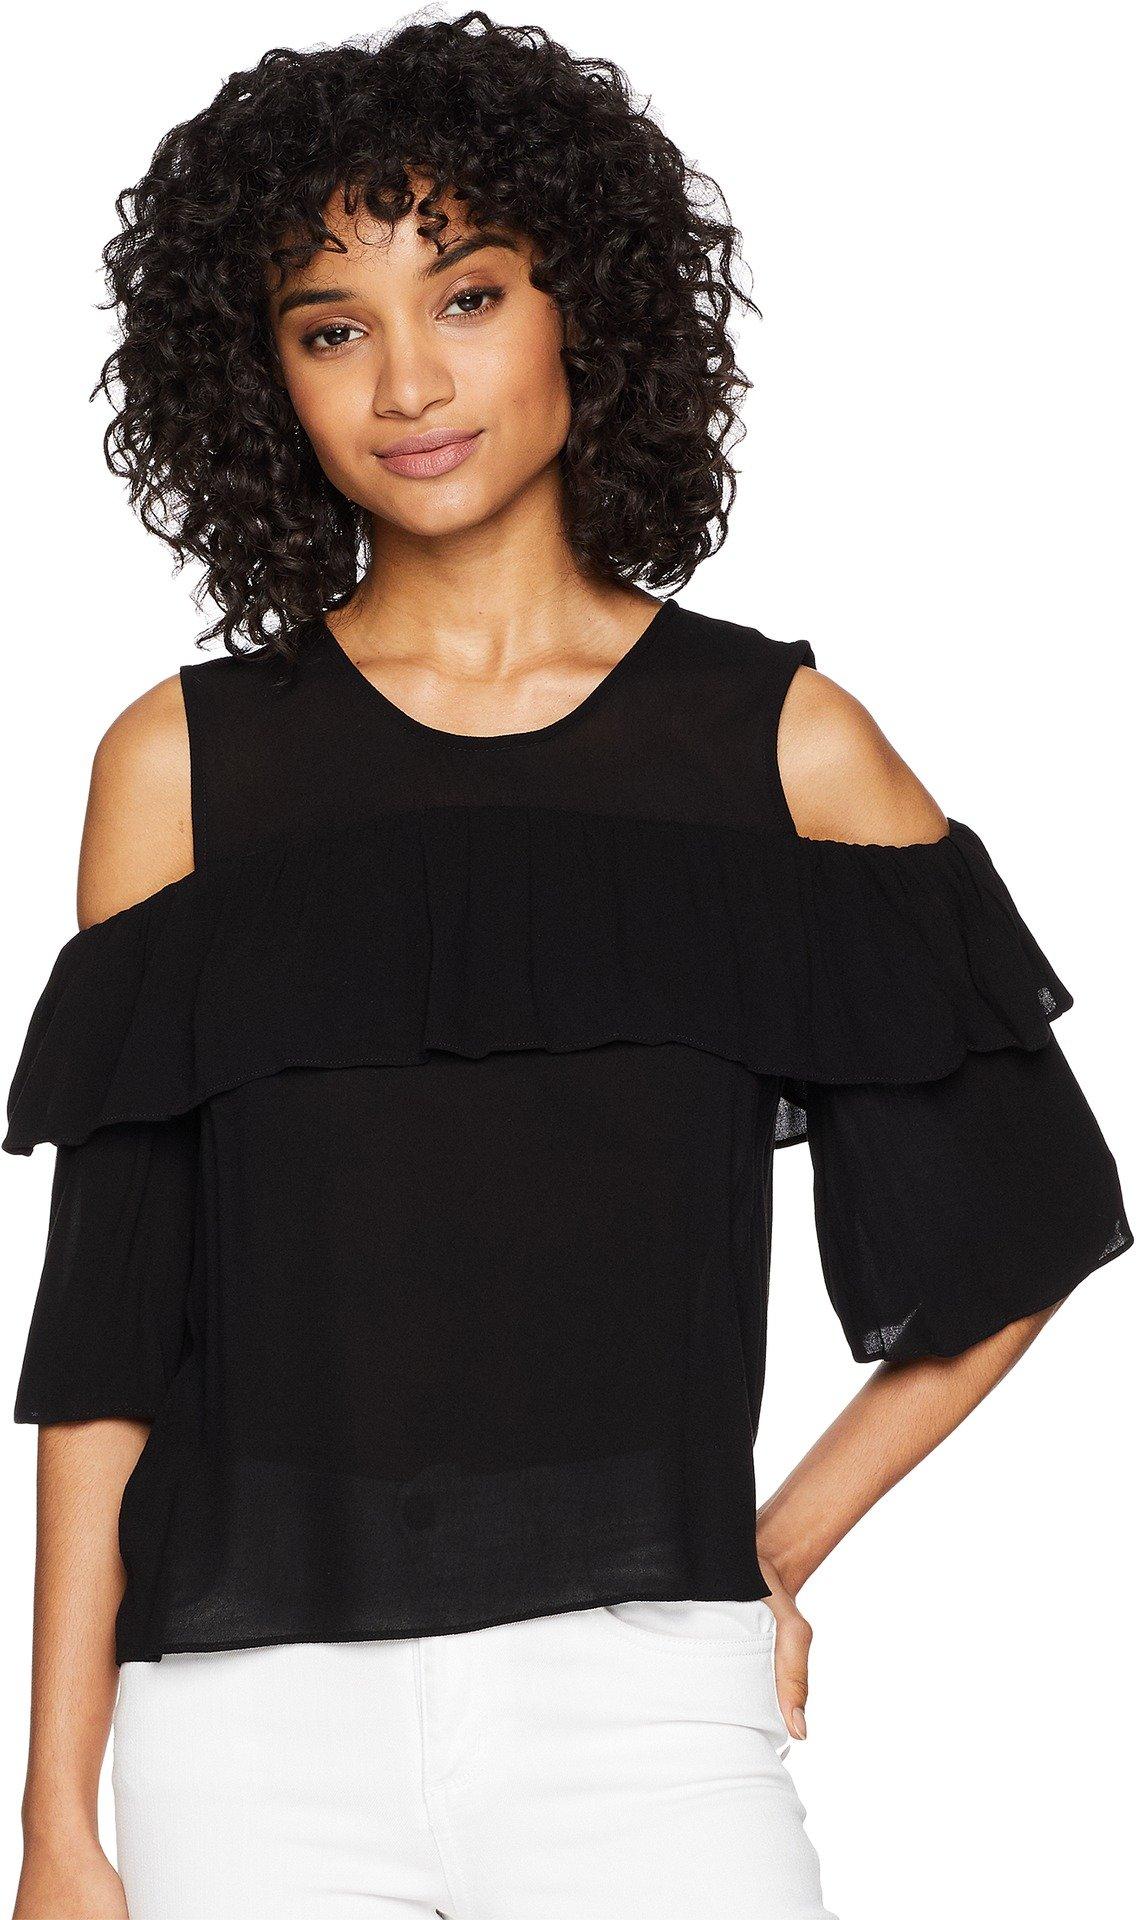 BCBGMAXAZRIA Women's Cold Shoulder Ruffle Top Black Medium